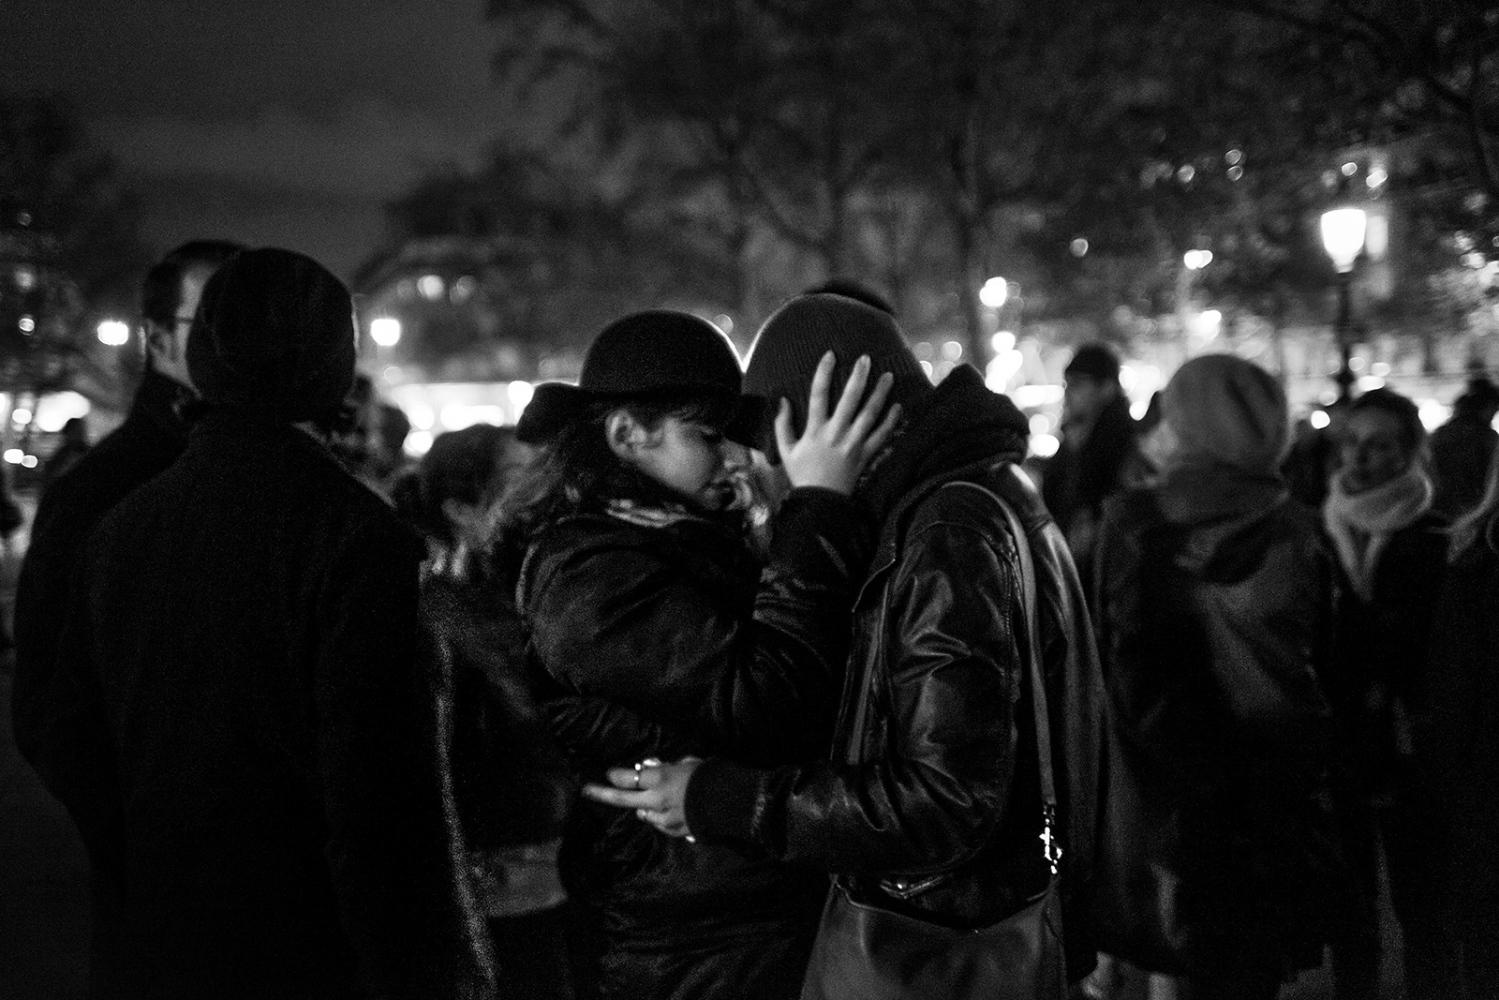 People gather and mourn in front of the statue in Place de la Republique. Paris, France, Place de la Republique. 14/11/2015. The aftermath of the terrorism attacks in Paris on 13/11/2015. Despite the ban on public meetings, many people gathered at the Place de la Republique to commemorate the victims of the terrorist attacks.